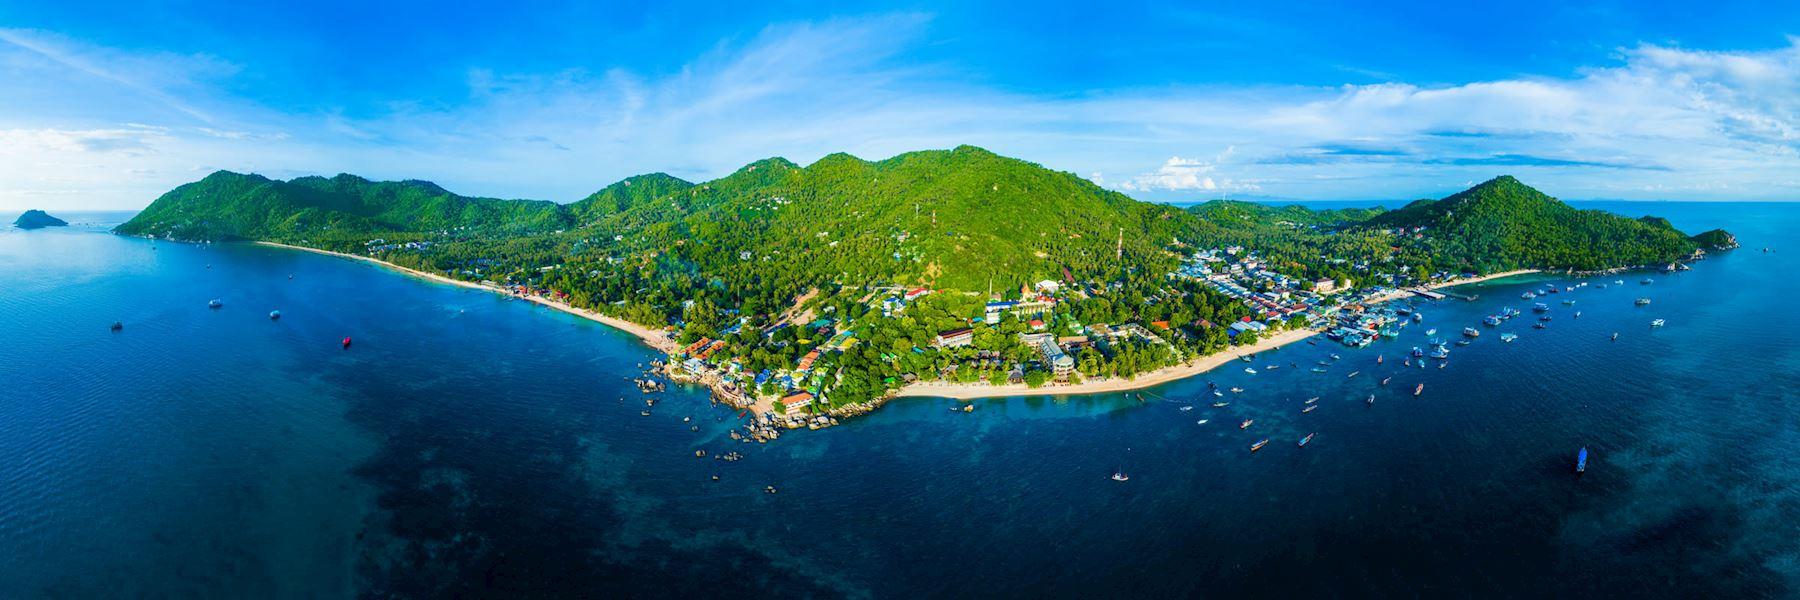 Visit Koh Tao, Thailand